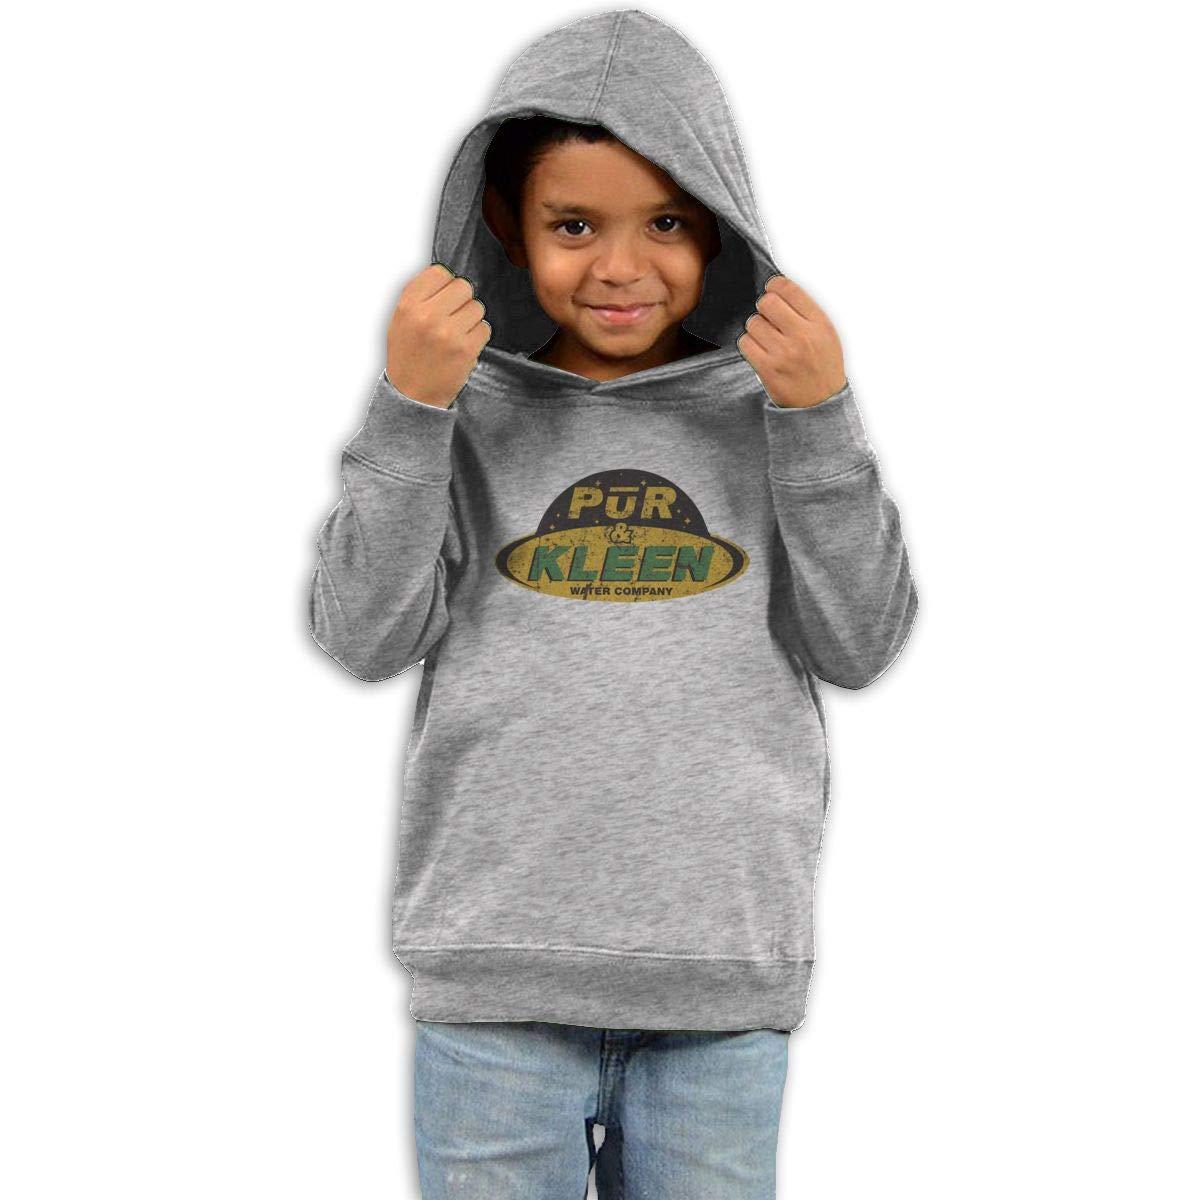 Stacy J. Payne Boys Pur N Kleen Particular Hoodies41 Gray